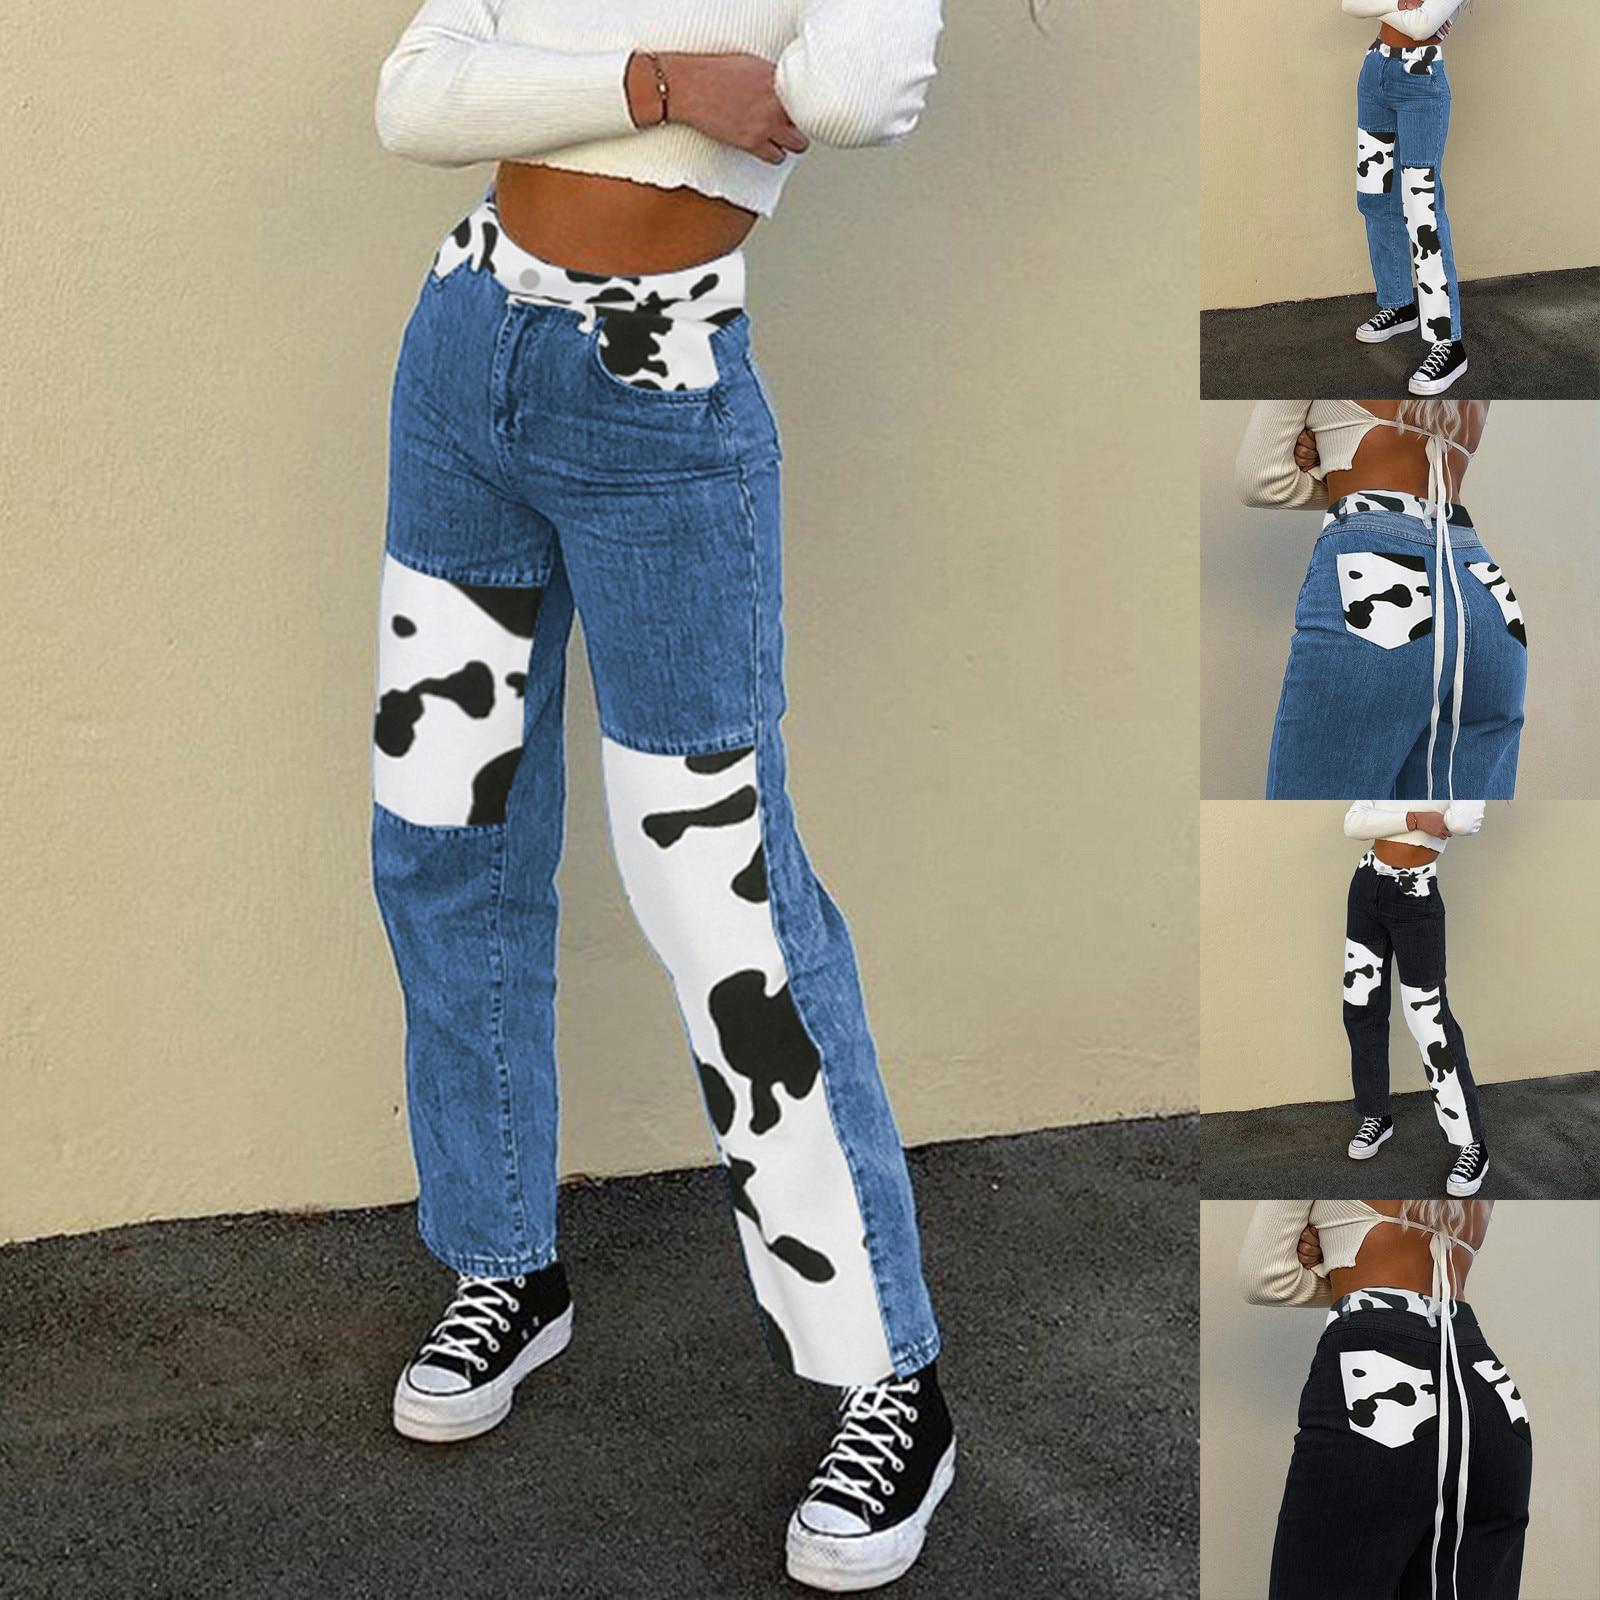 Women's Pants Straight Leg Jeans Women High Waist Slim Loose Cow Printed Matching Color block Fashio